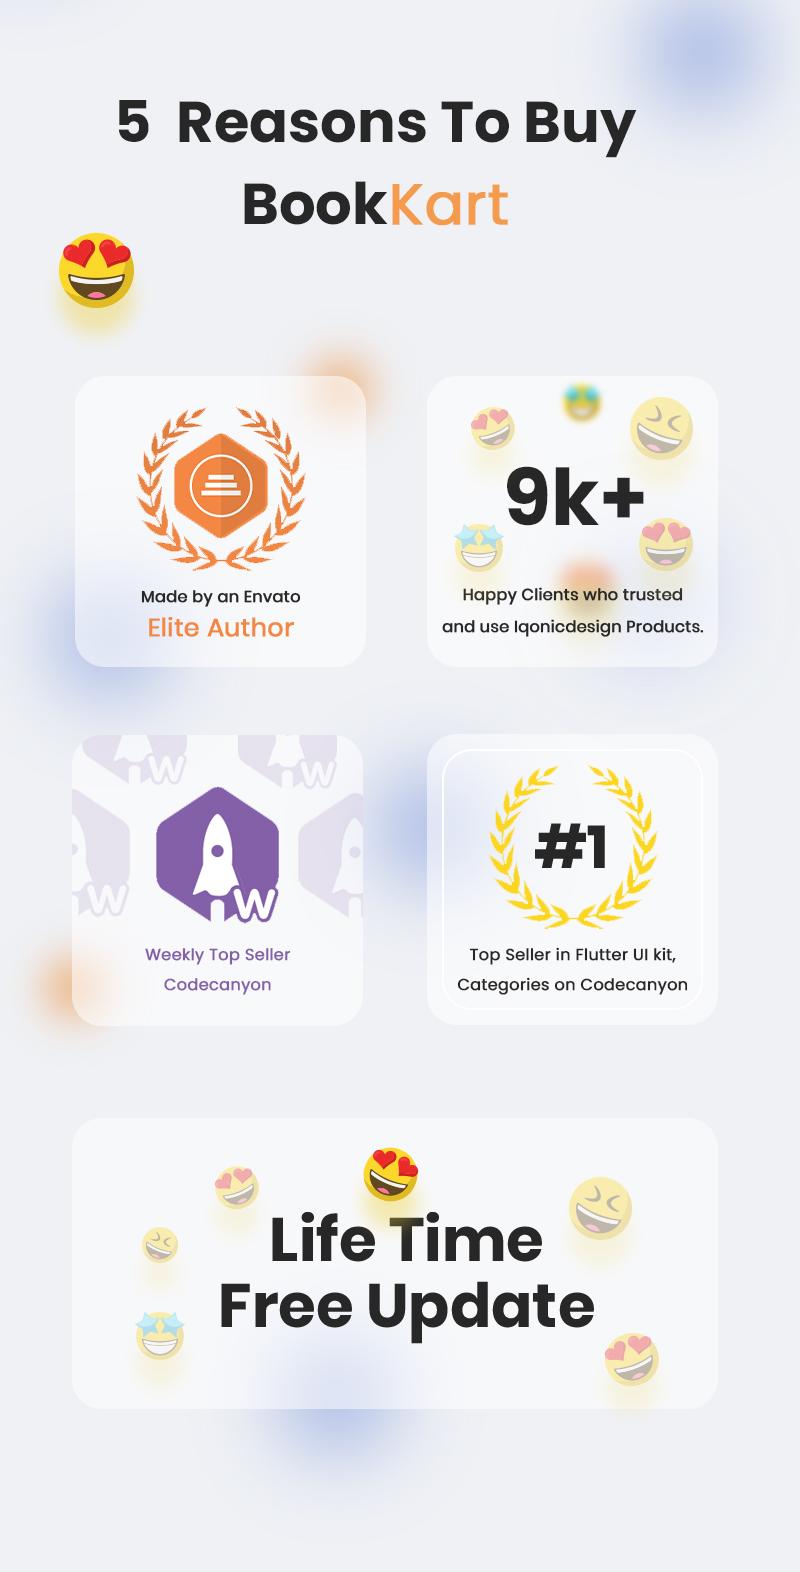 Flutter Ebook Reader App For WordPress with WooCommerce | Bookkart | Iqonic Design flutter ebook reader app for wordpress with woocommerce Bookkart 7